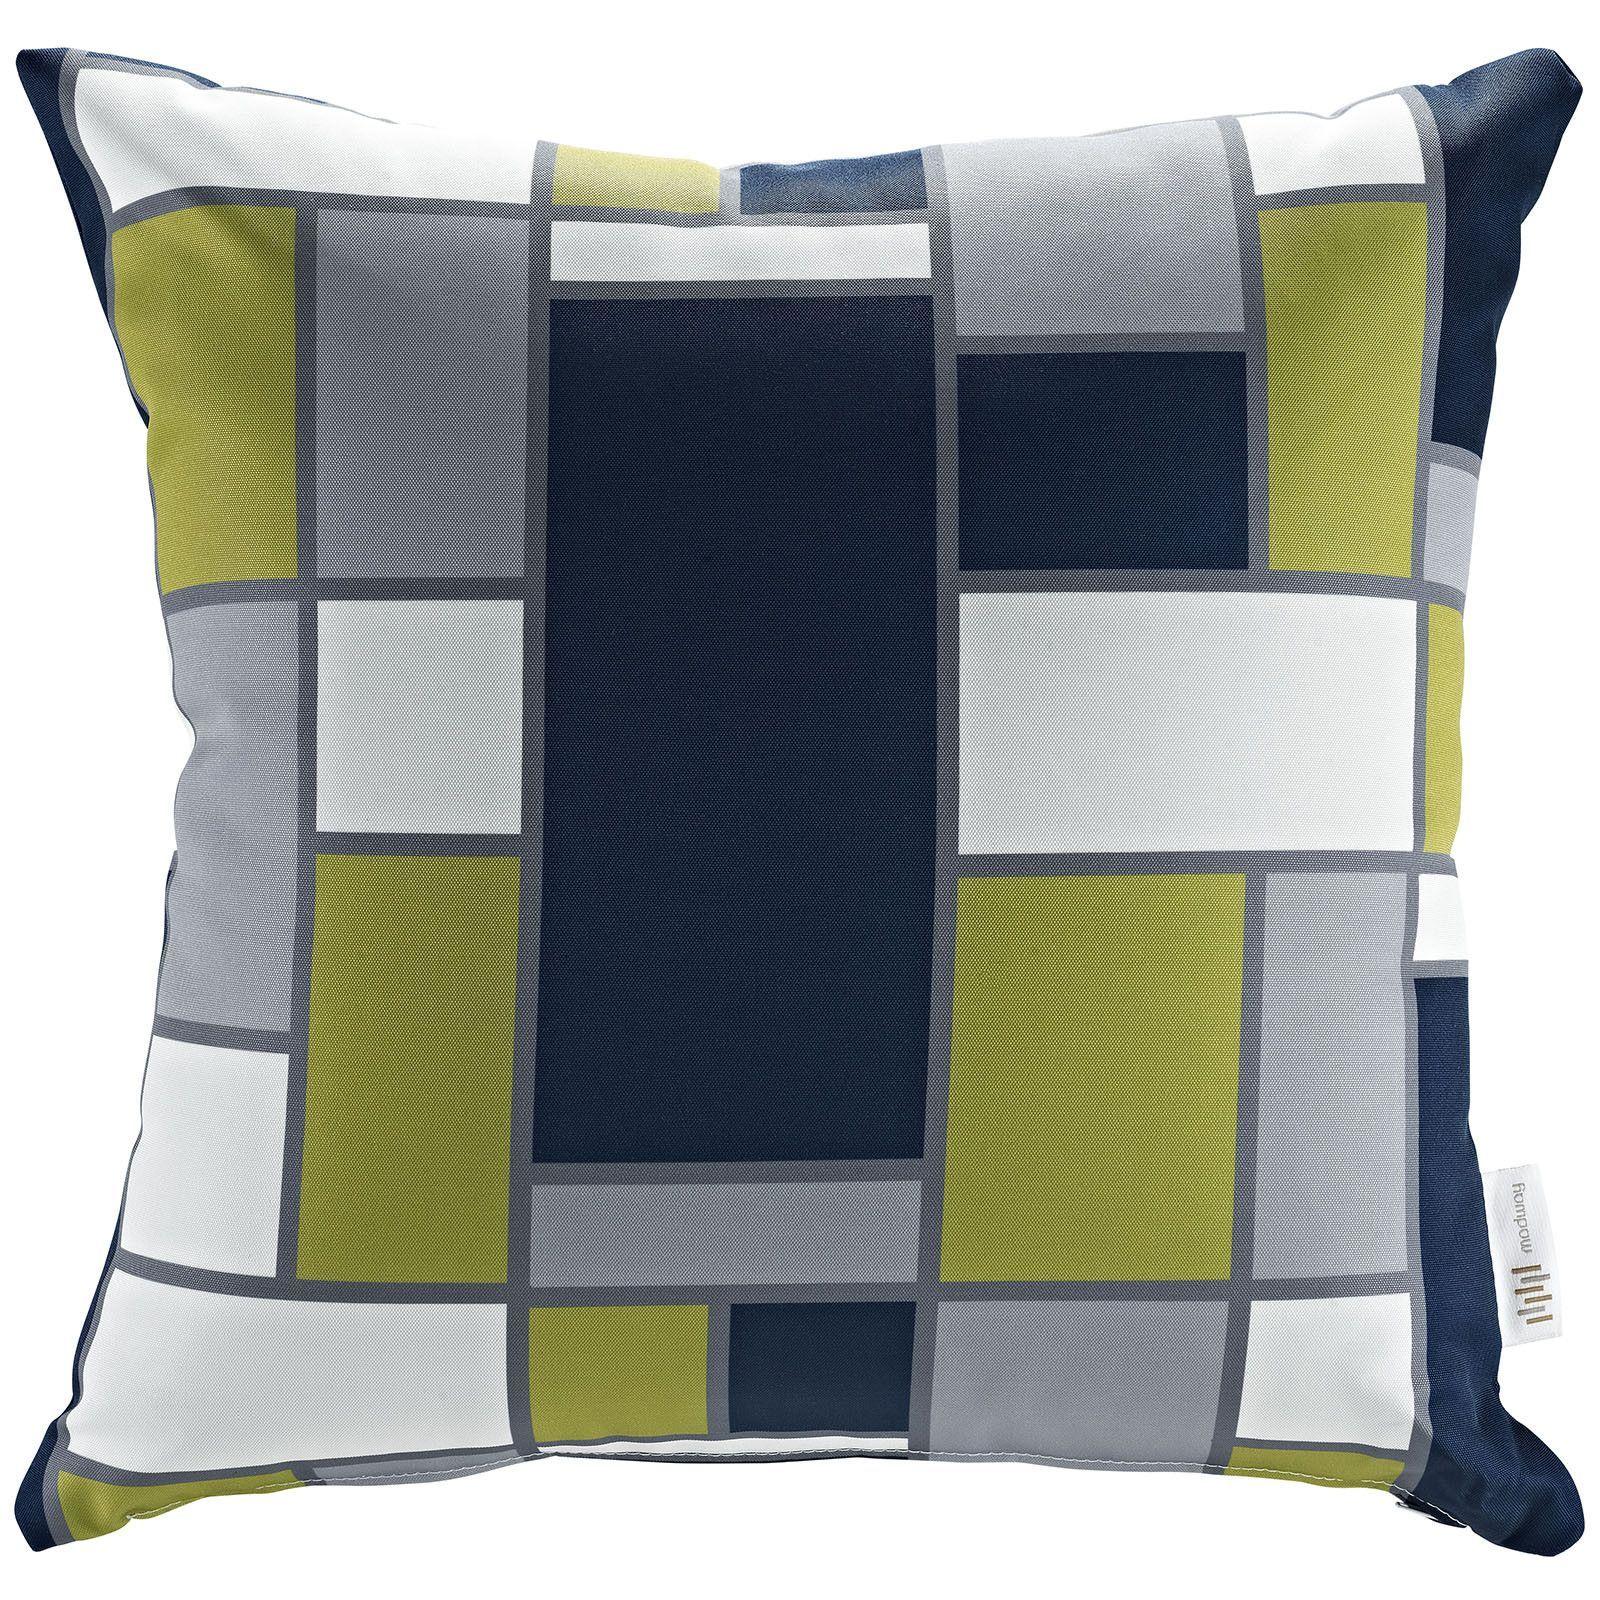 Modway Outdoor Patio Pillow